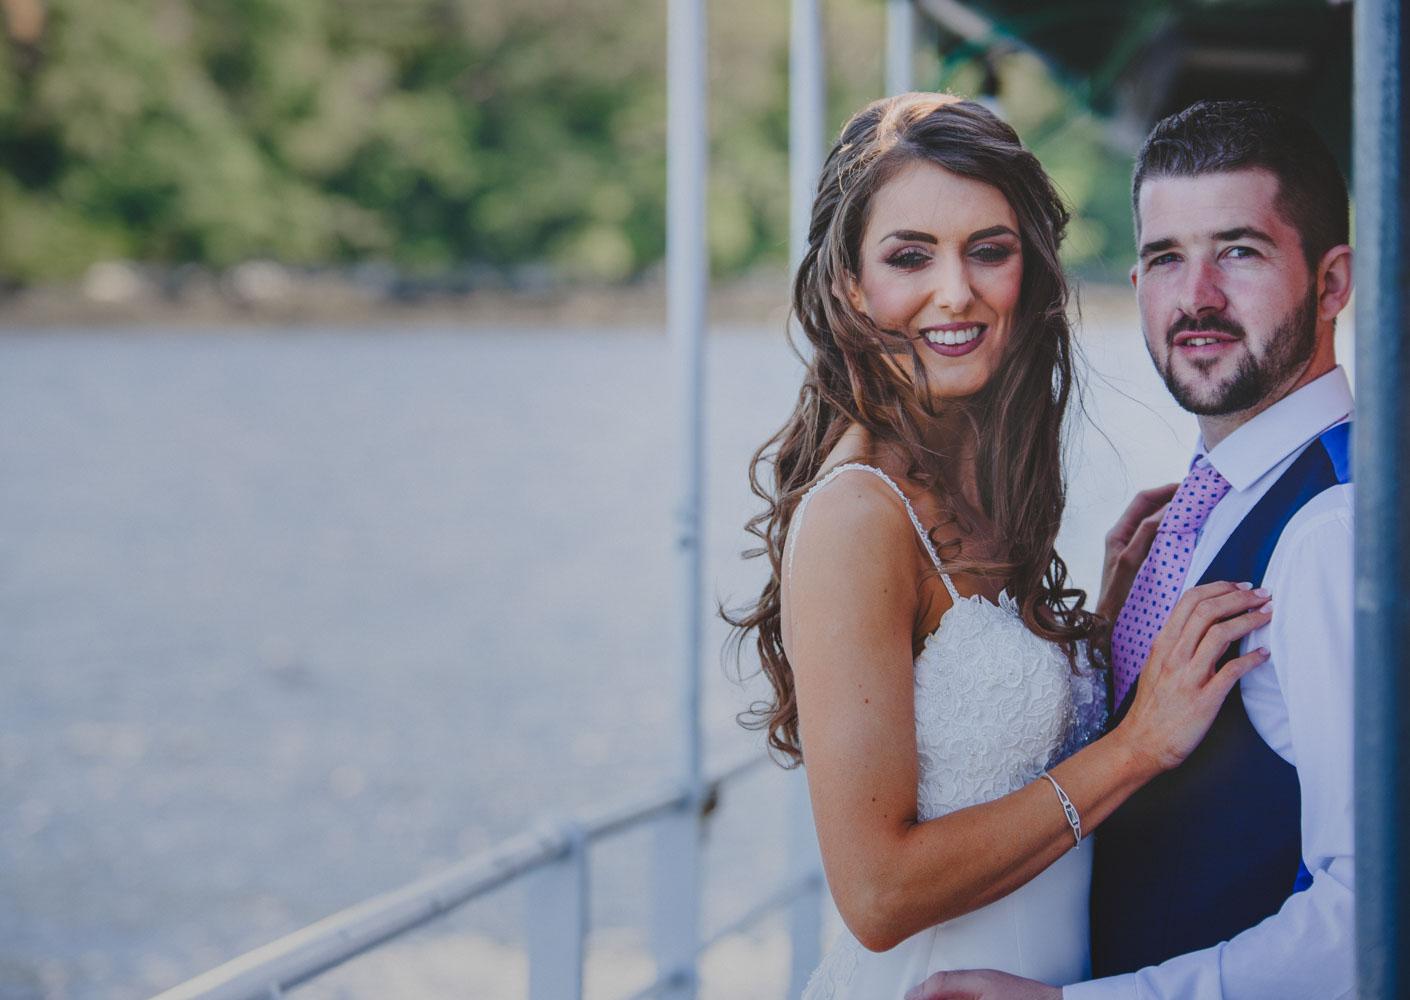 Eadaoin & Jason Killarney 17.06.2017  (reportage of the wedding as second photographer)